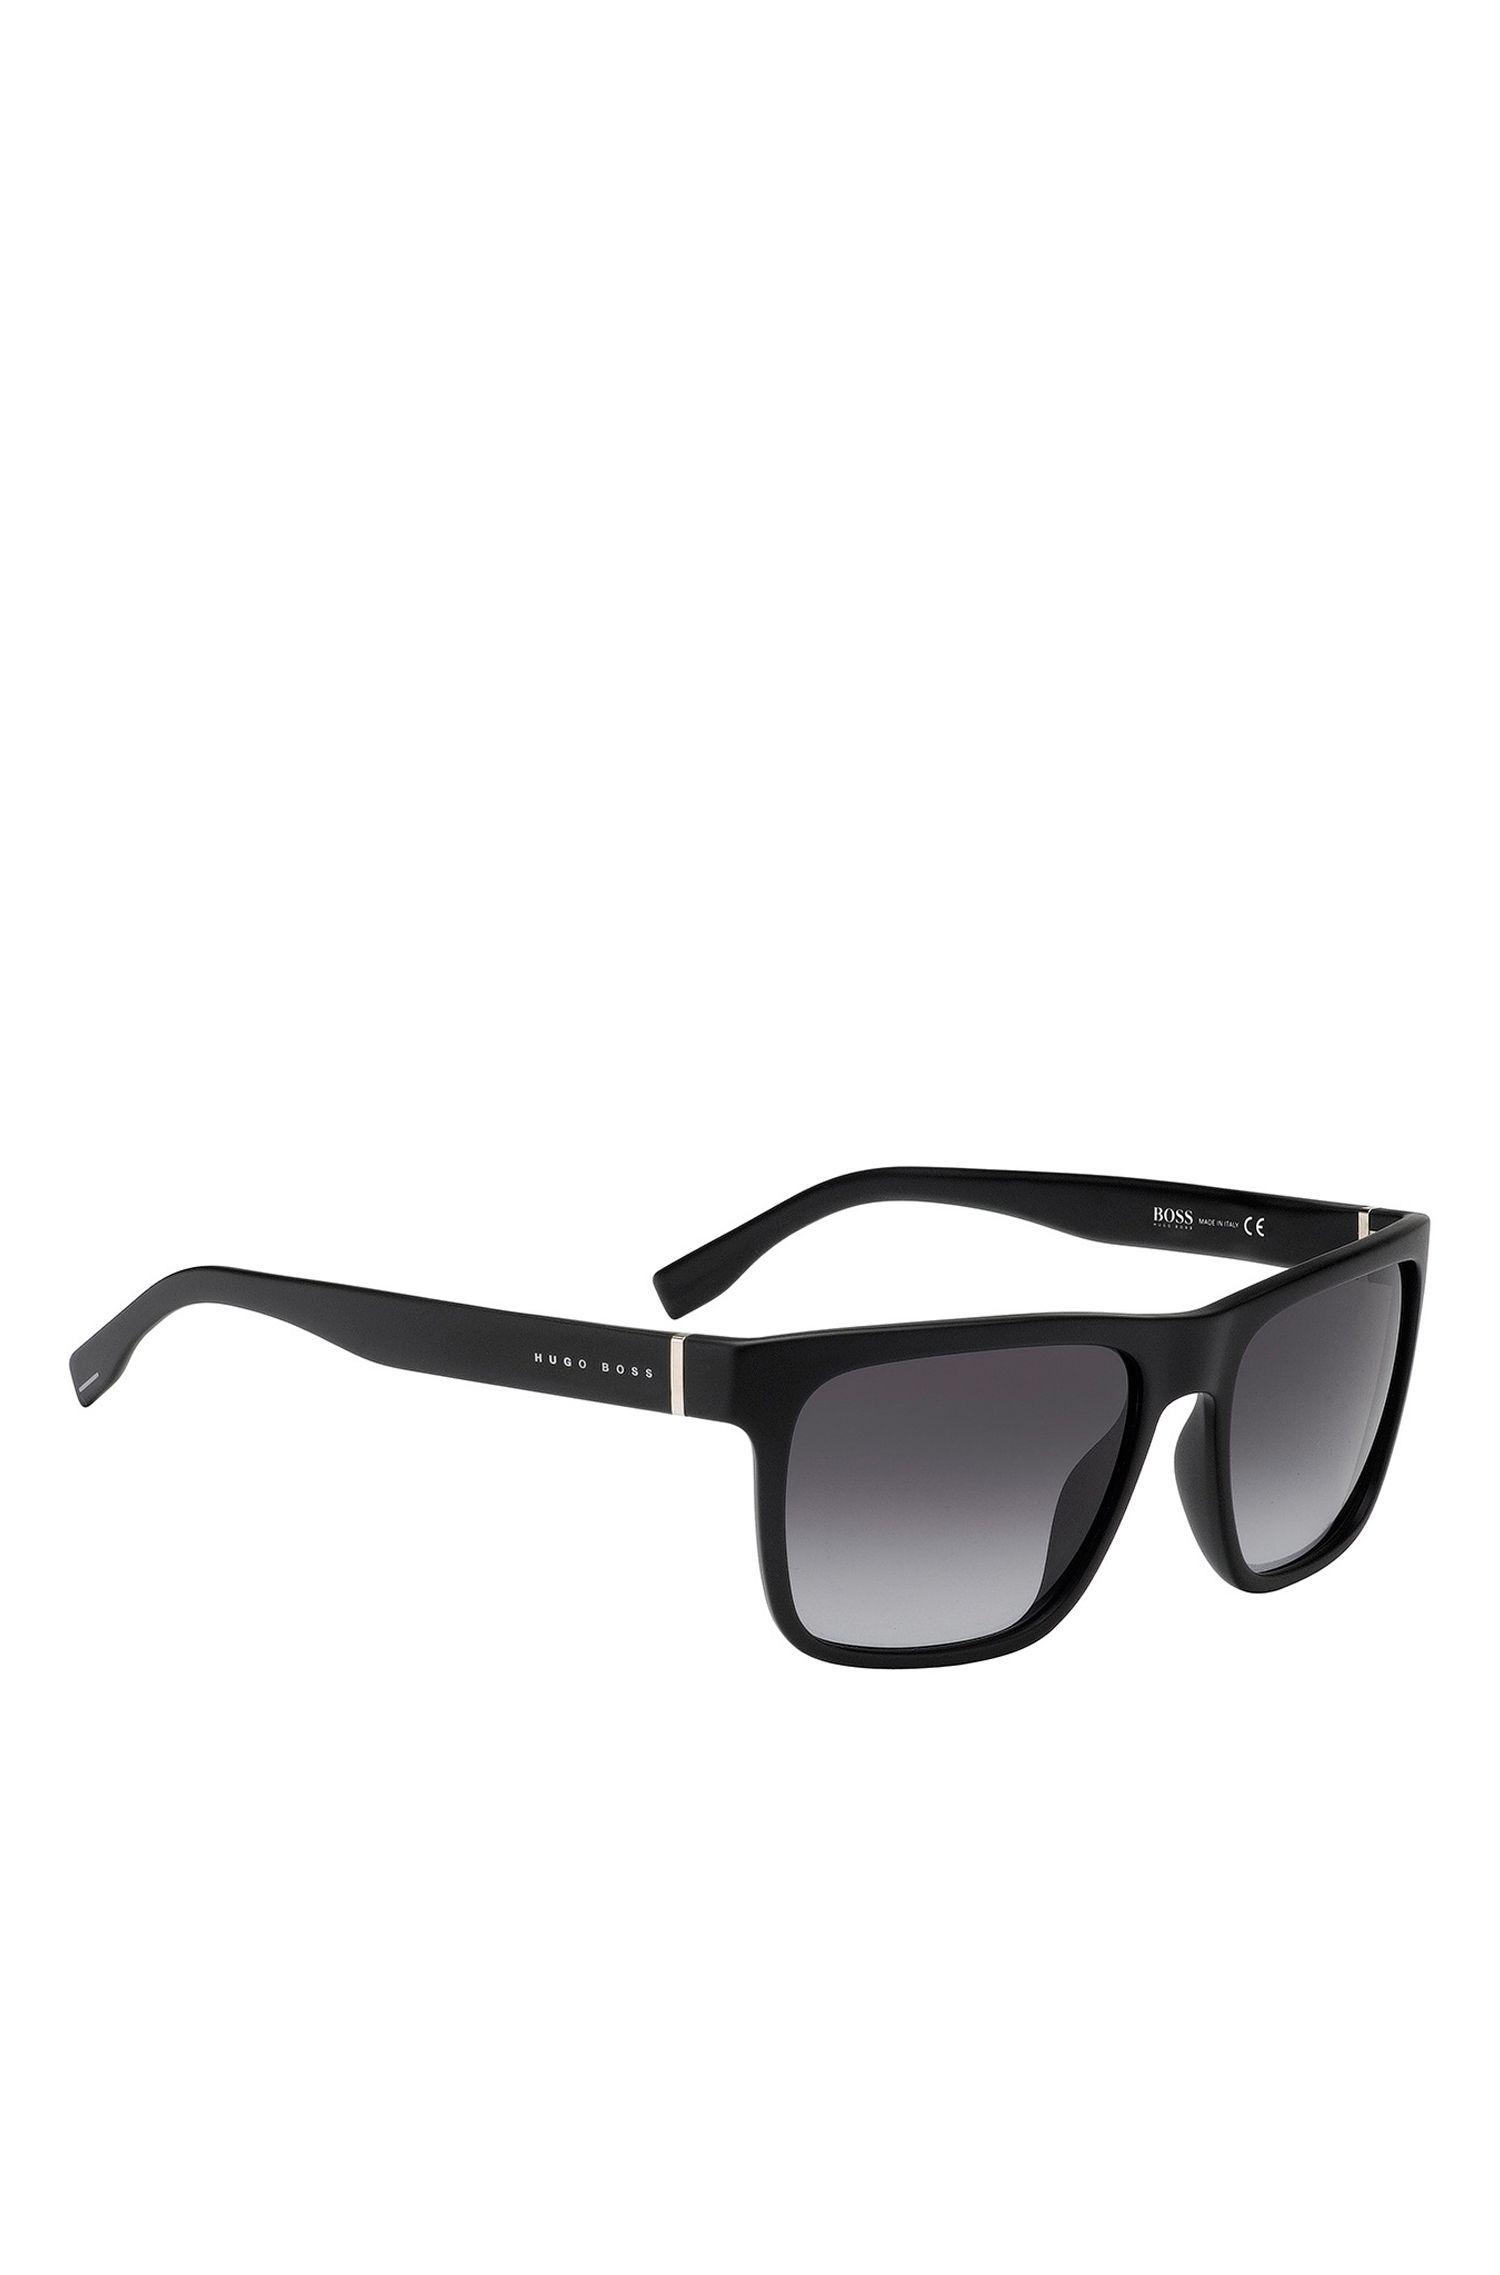 'BOSS 0727' | Shaded Lens Regtangular Optyl Sunglasses